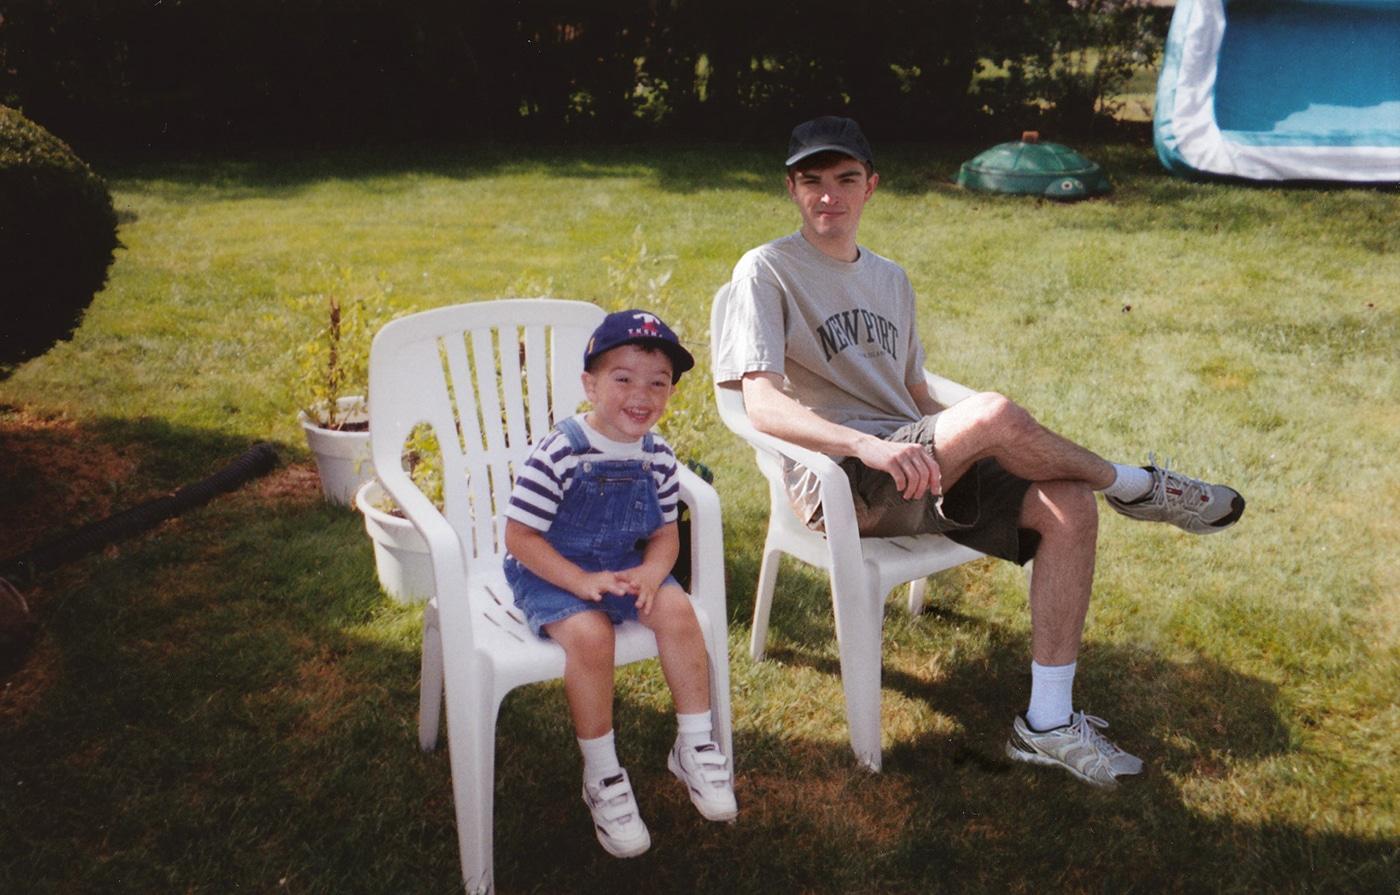 Conor Nickerson Recreating Childhood Photos